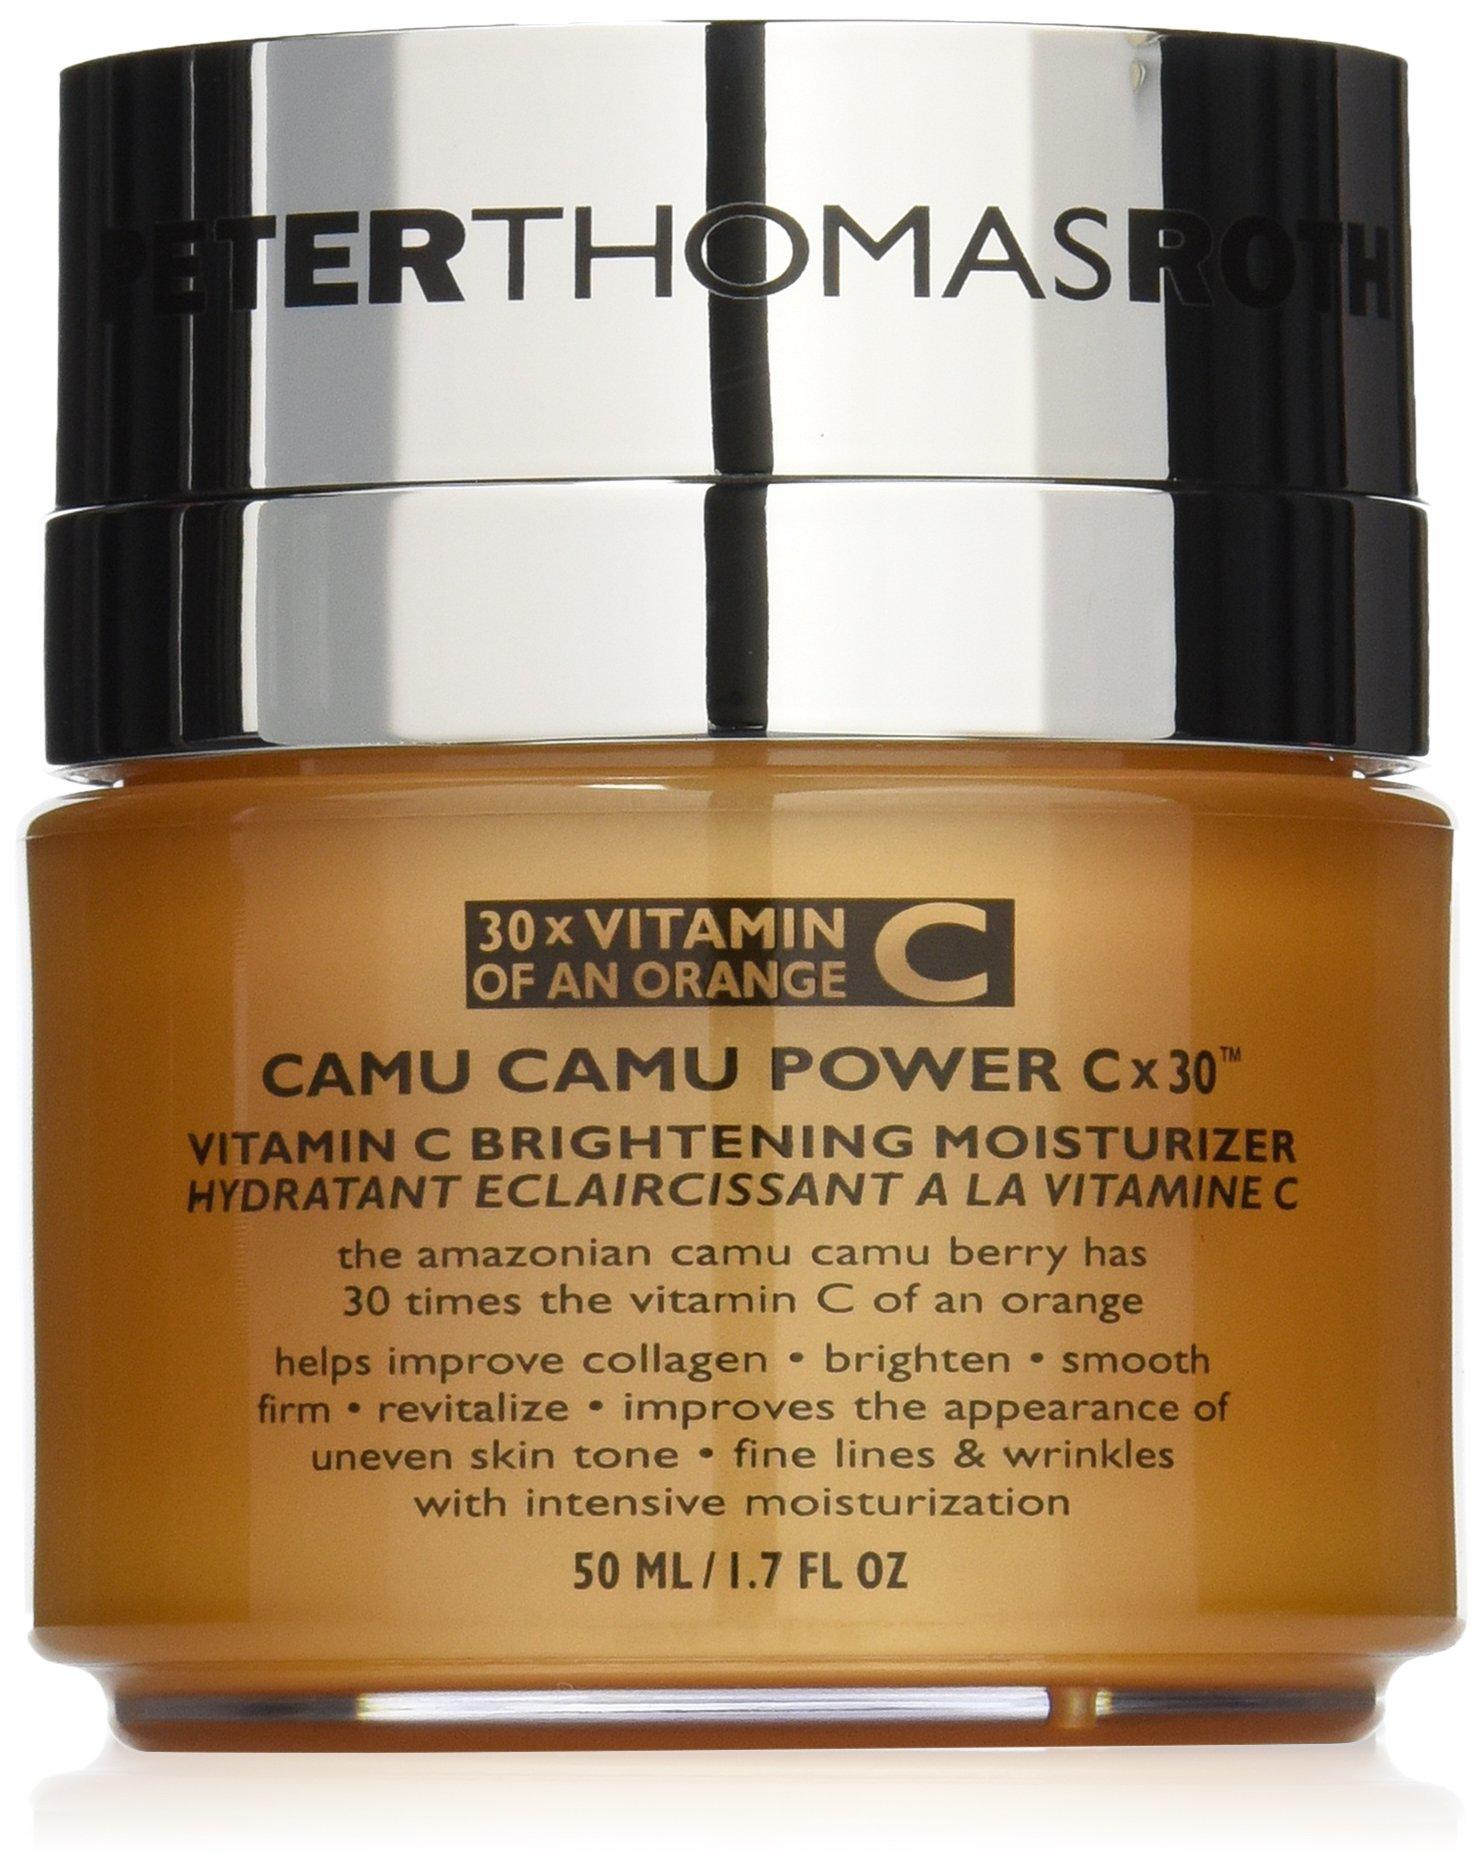 Peter Thomas Roth Facial Day Cream SPF 30 (PT-314) Udderly Smooth Creme, 4 Ounce